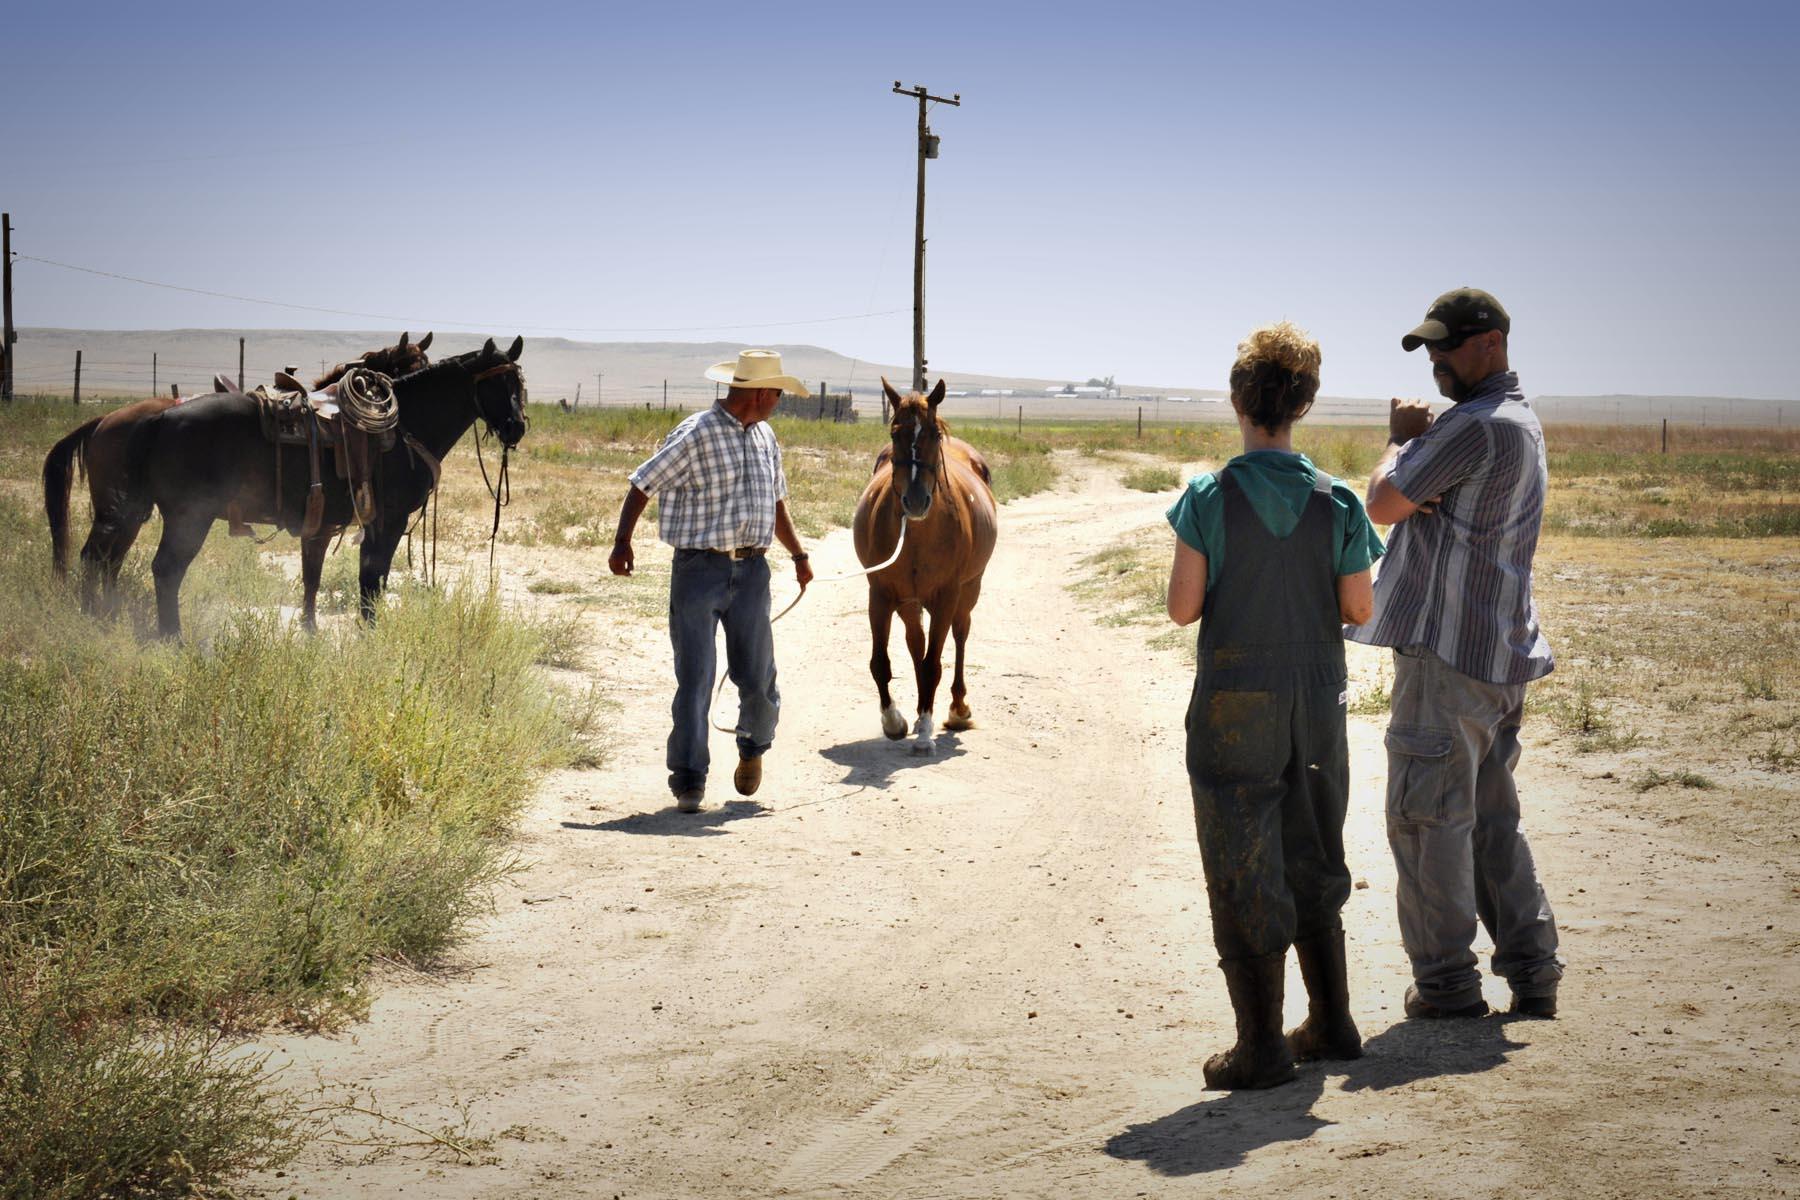 cow ultrasound, bovine ultrasound, increase revenue in veterinary practice